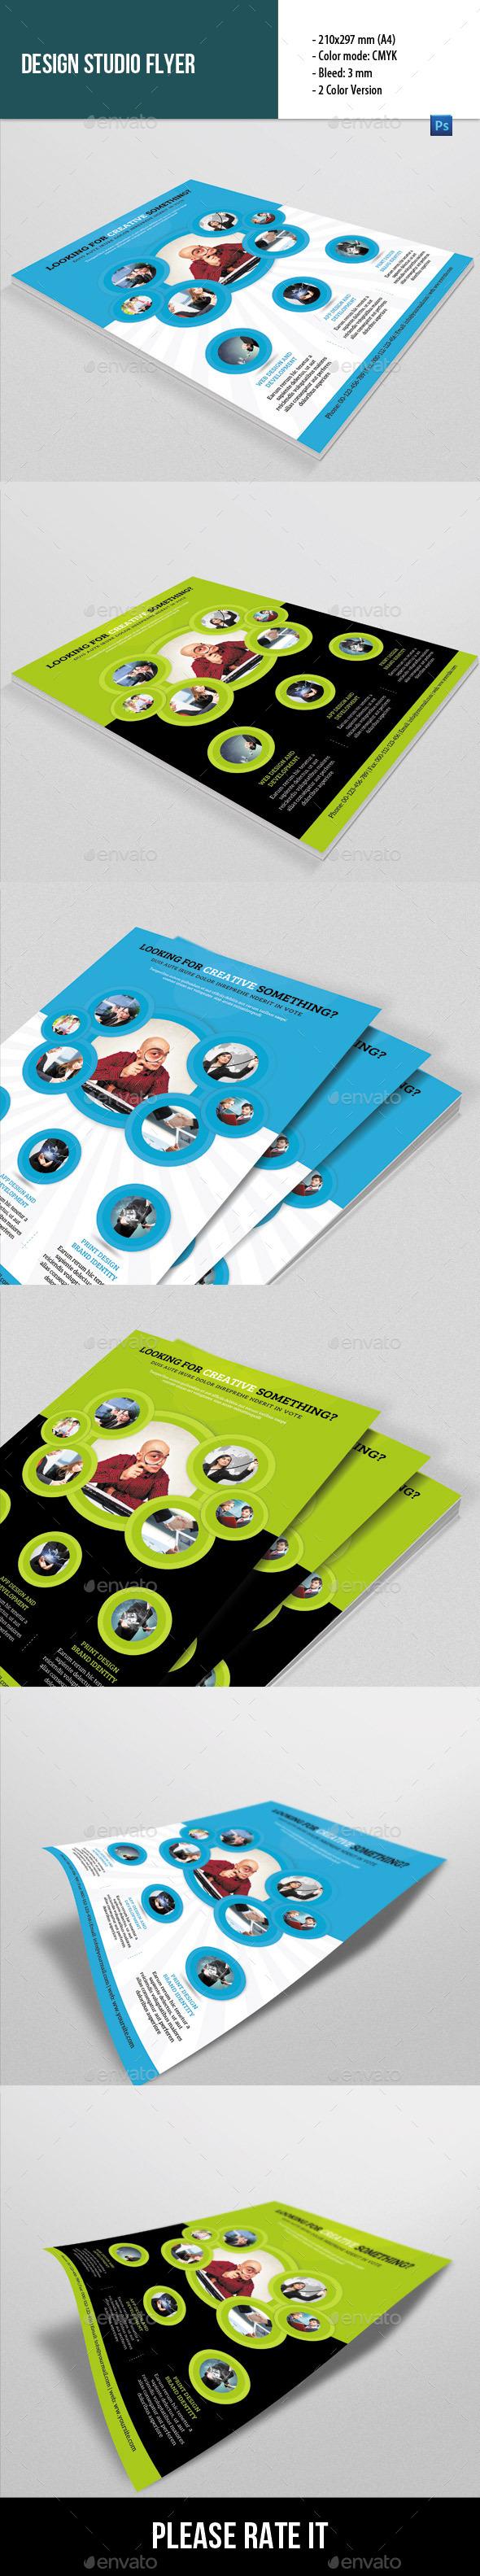 GraphicRiver Flyer Template for Design Studio 8956162